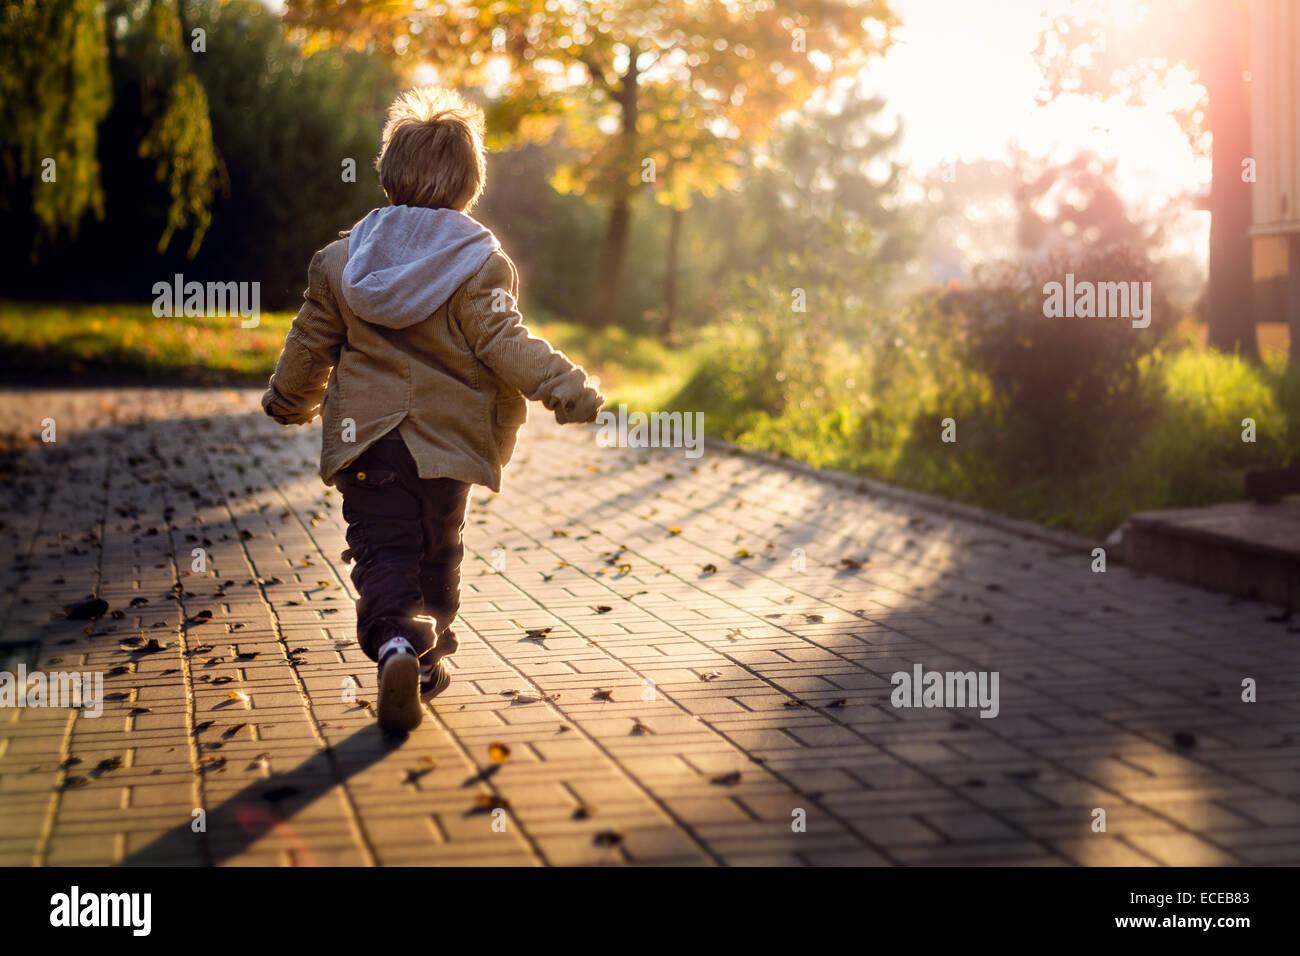 Garçon courir vers rising sun Photo Stock